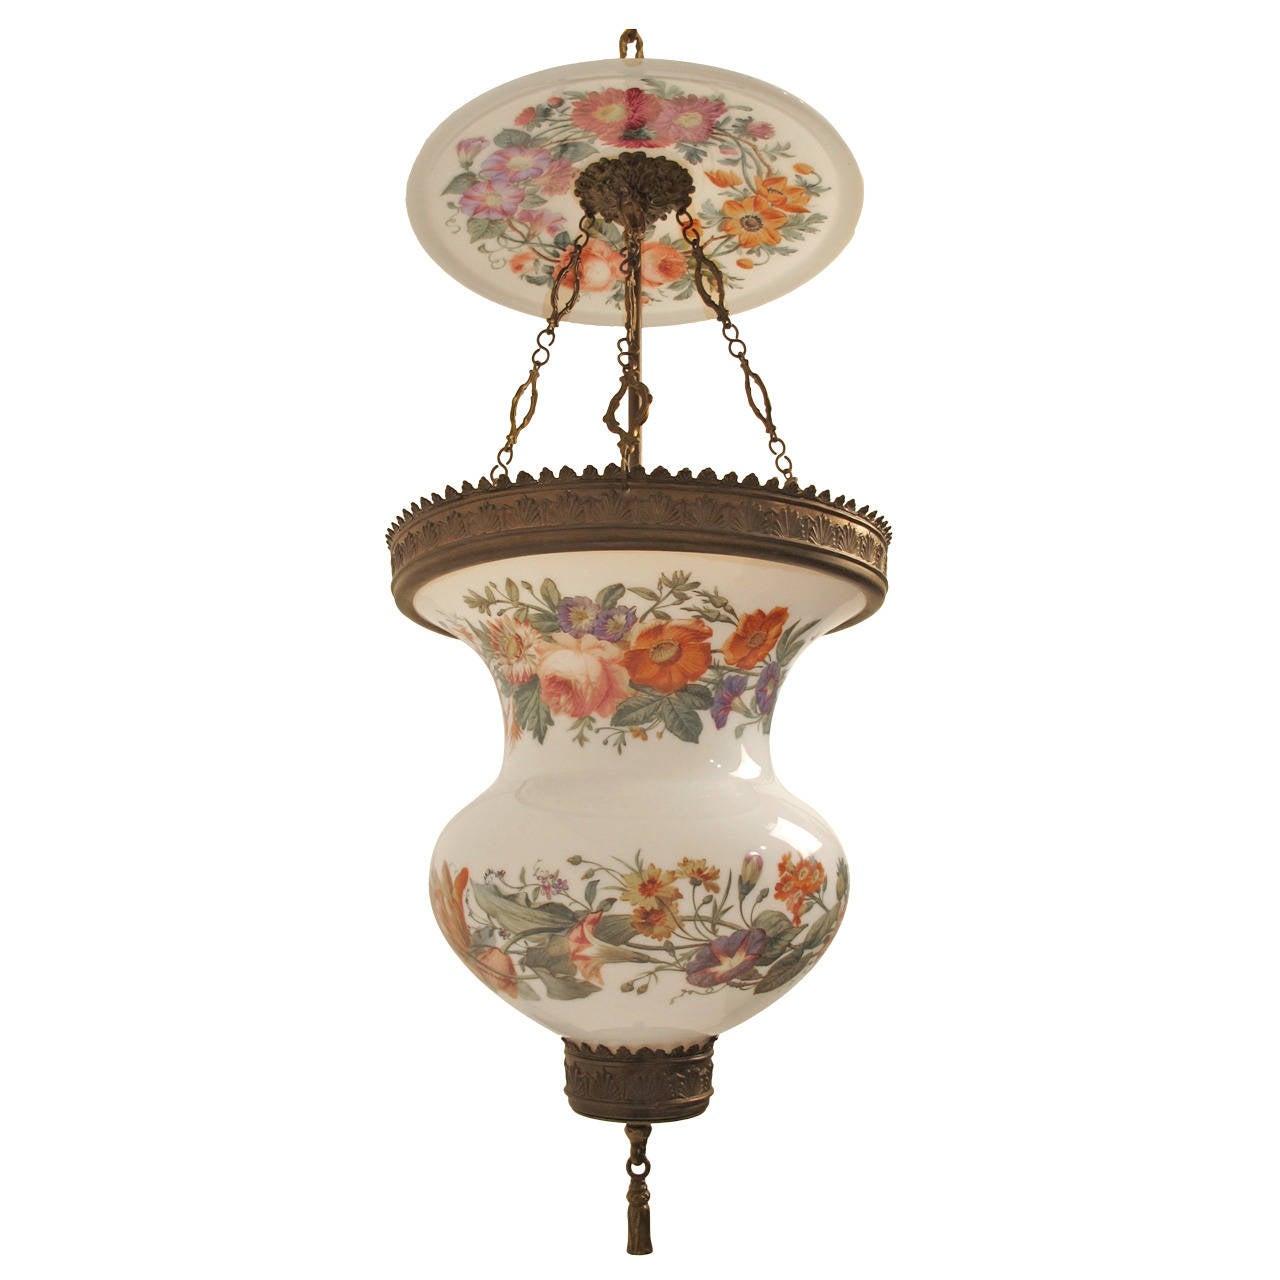 19th Century Hurricane Lamp Light Fixture At 1stdibs